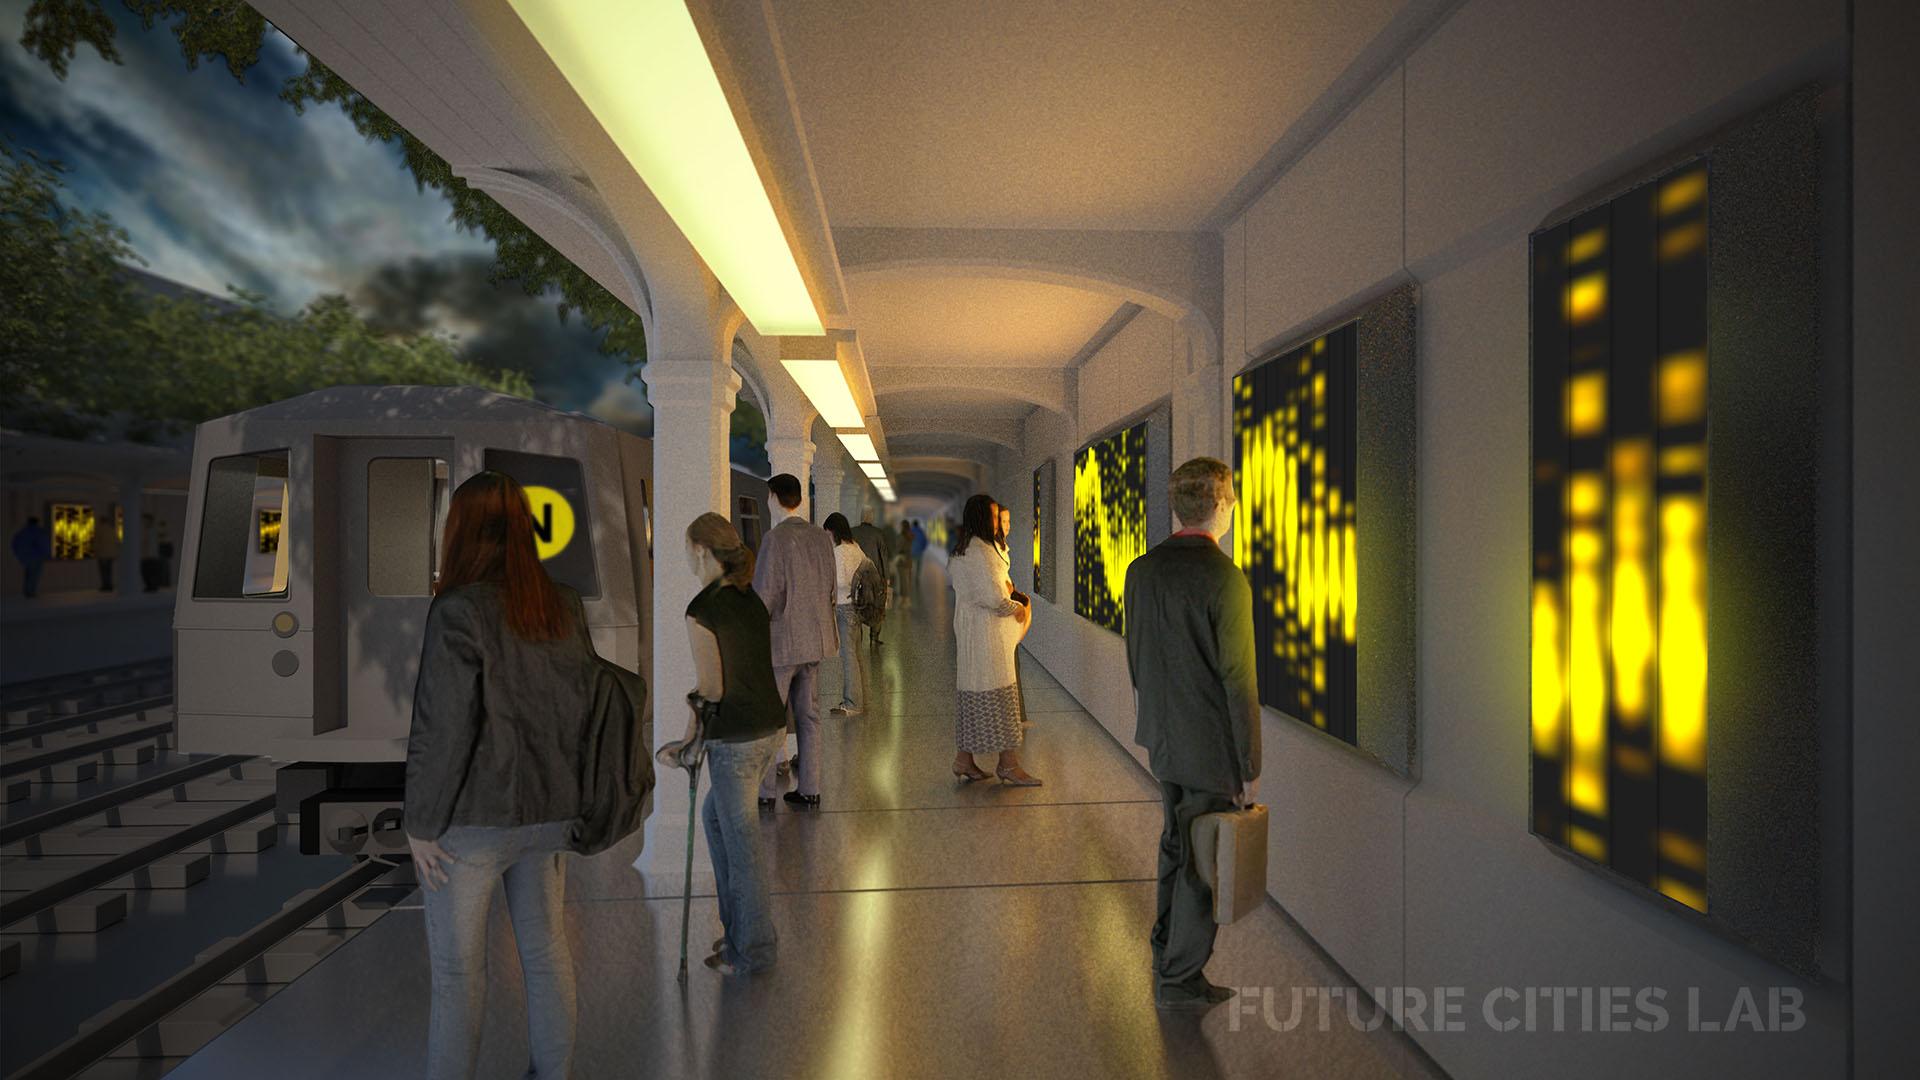 Lightstream_DownHall_FutureCitiesLab.jpg